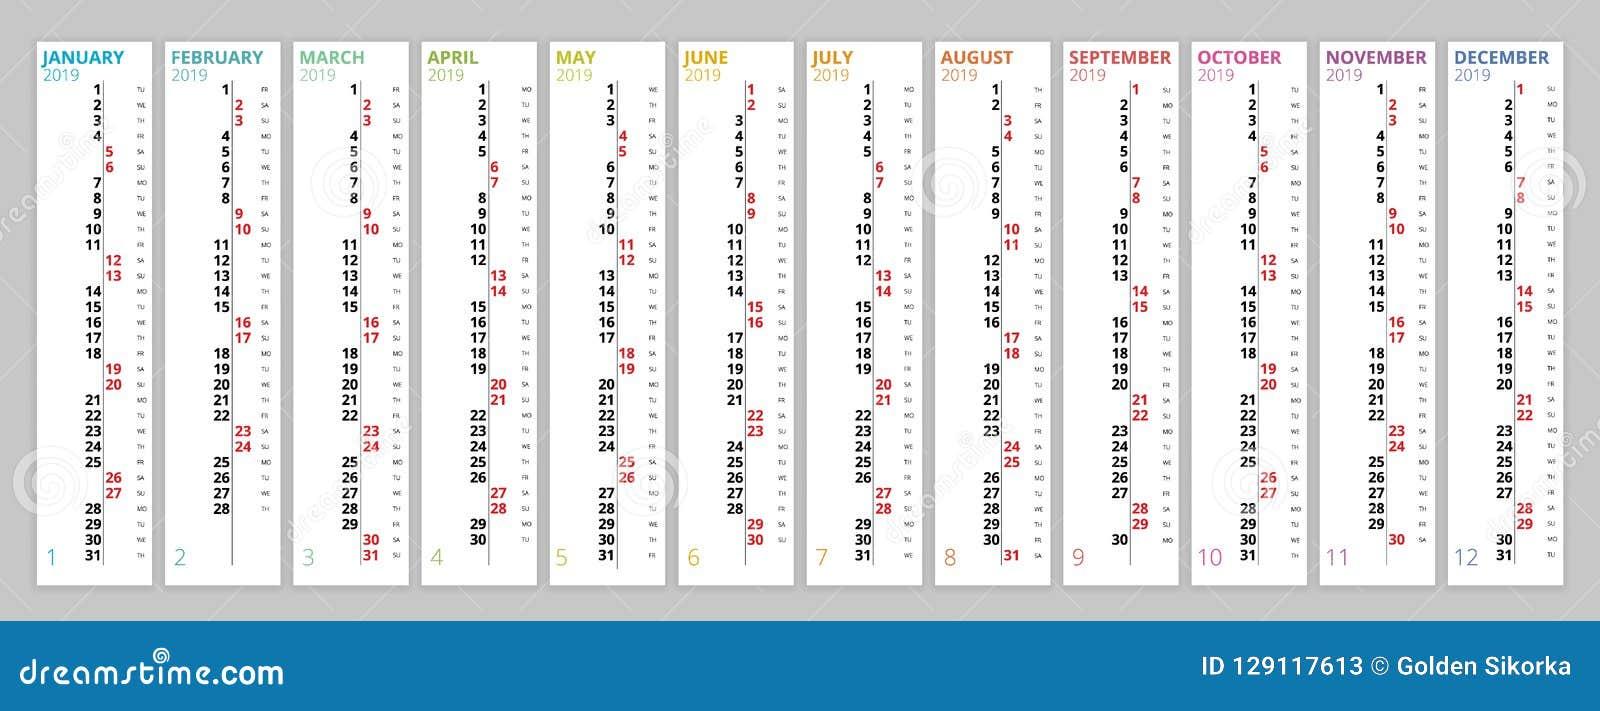 Calendar February 2019 Verticale Vertical Rainbow 2019 Calendar Vector, English Language. 2019